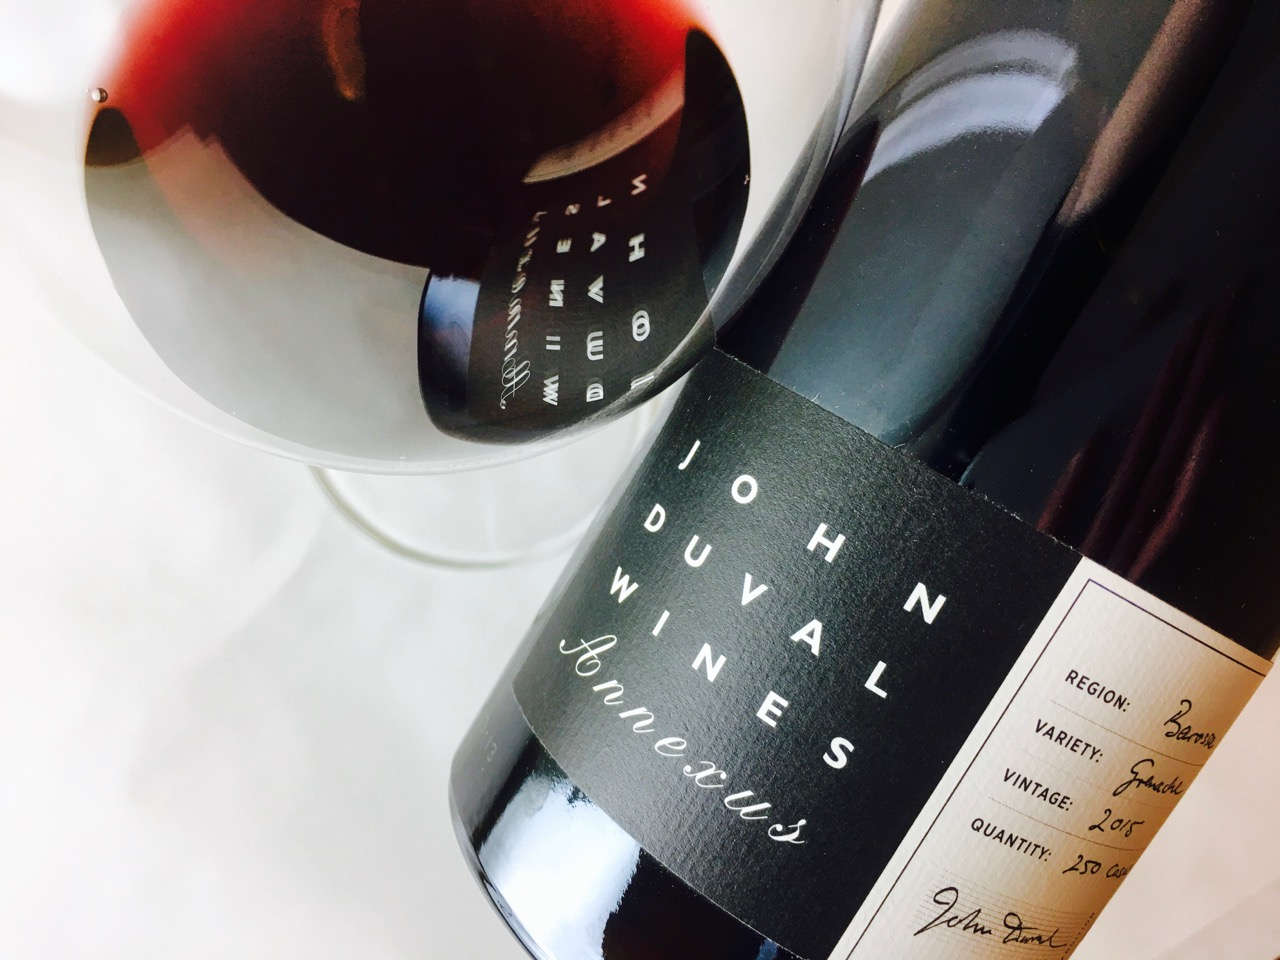 2015 John Duval Wines Grenache Annexus Barossa